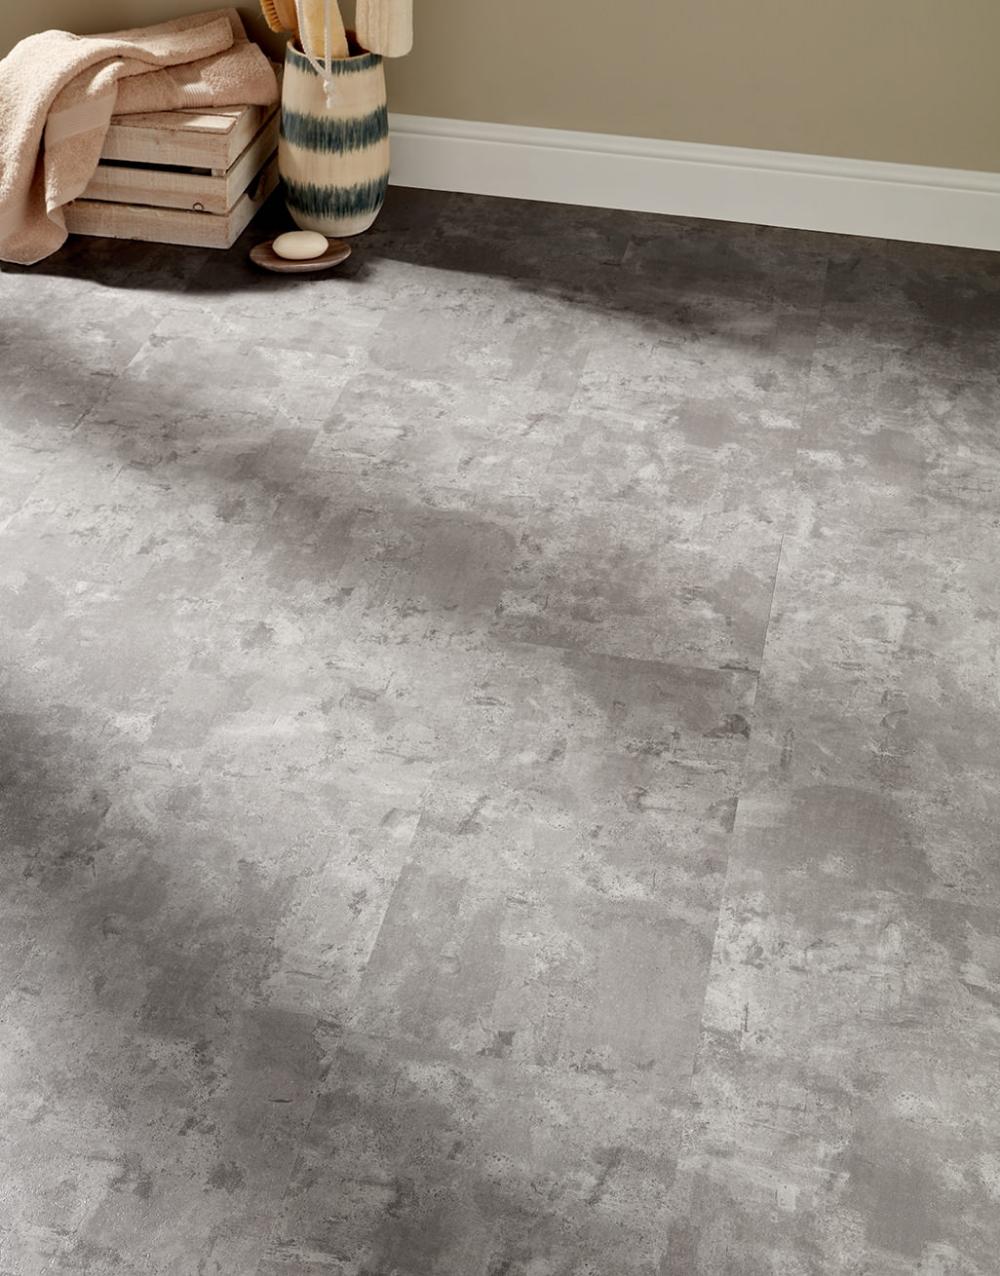 Venice Tile Click Murano Concrete LVT Flooring in 2020